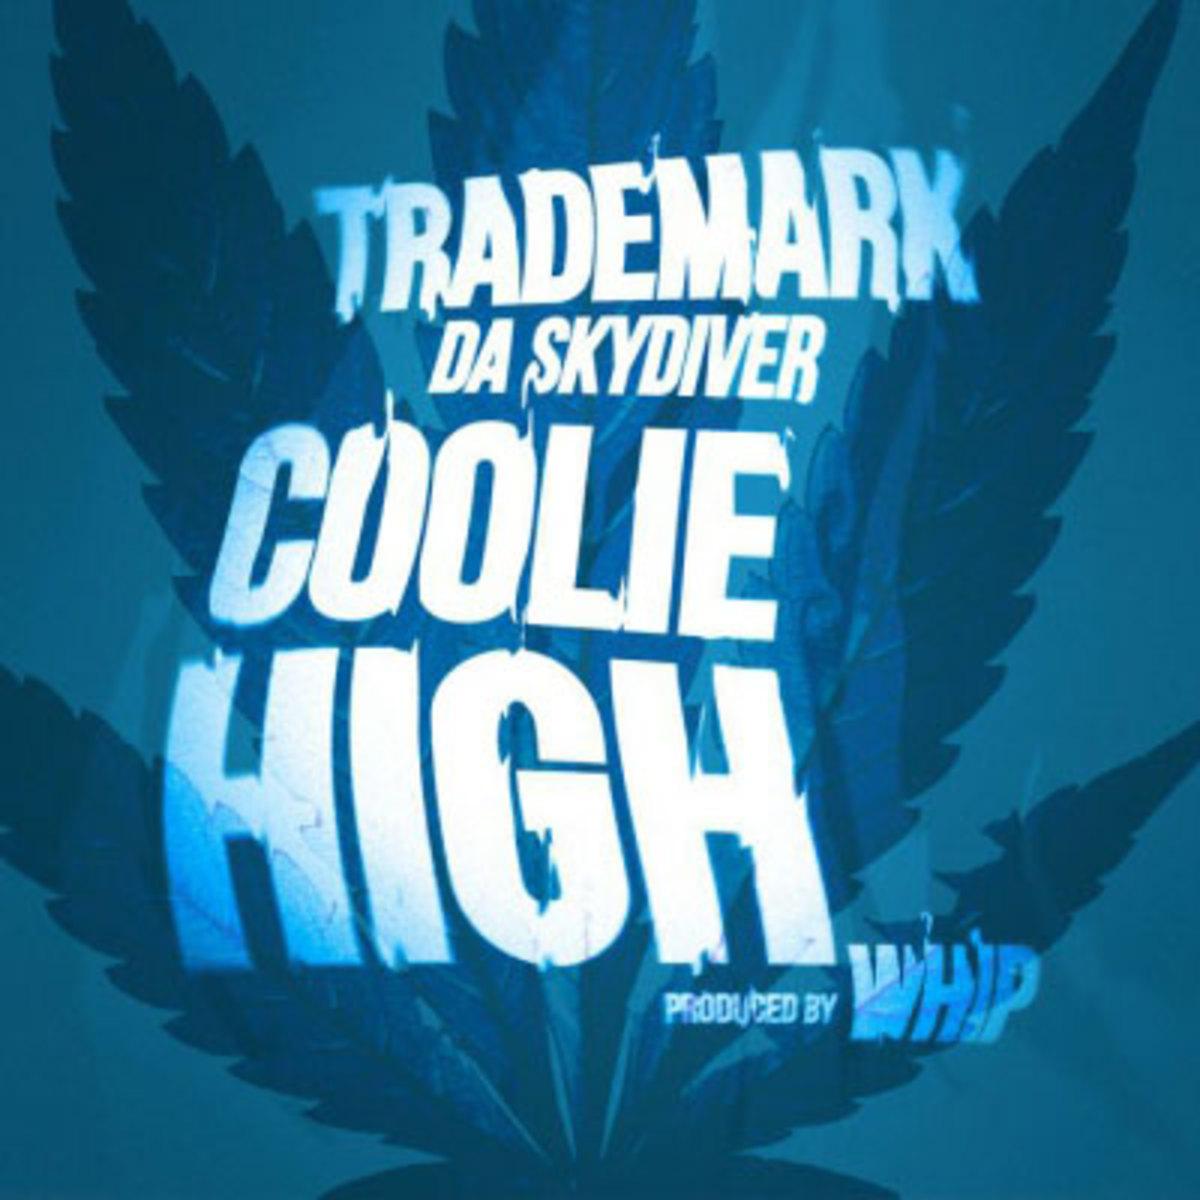 trademark-da-skydiver-coolie-high.jpg